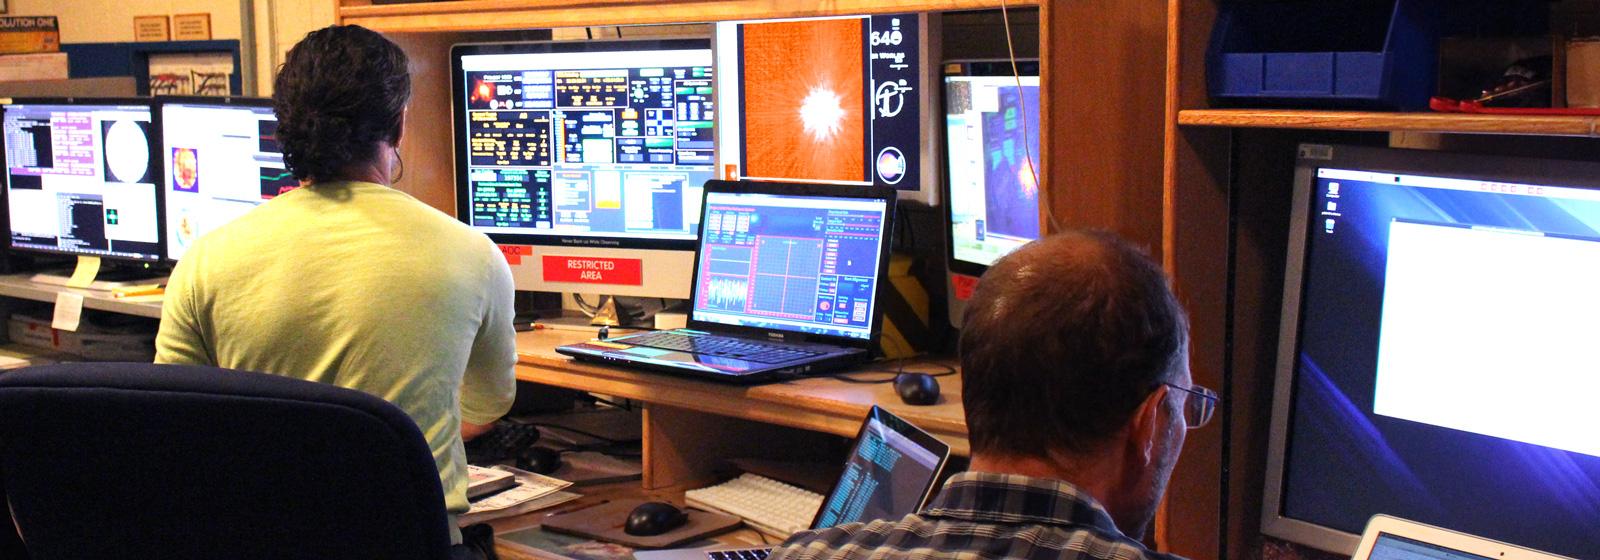 data room of the hale telescope palomarcaltech caltech recreation room